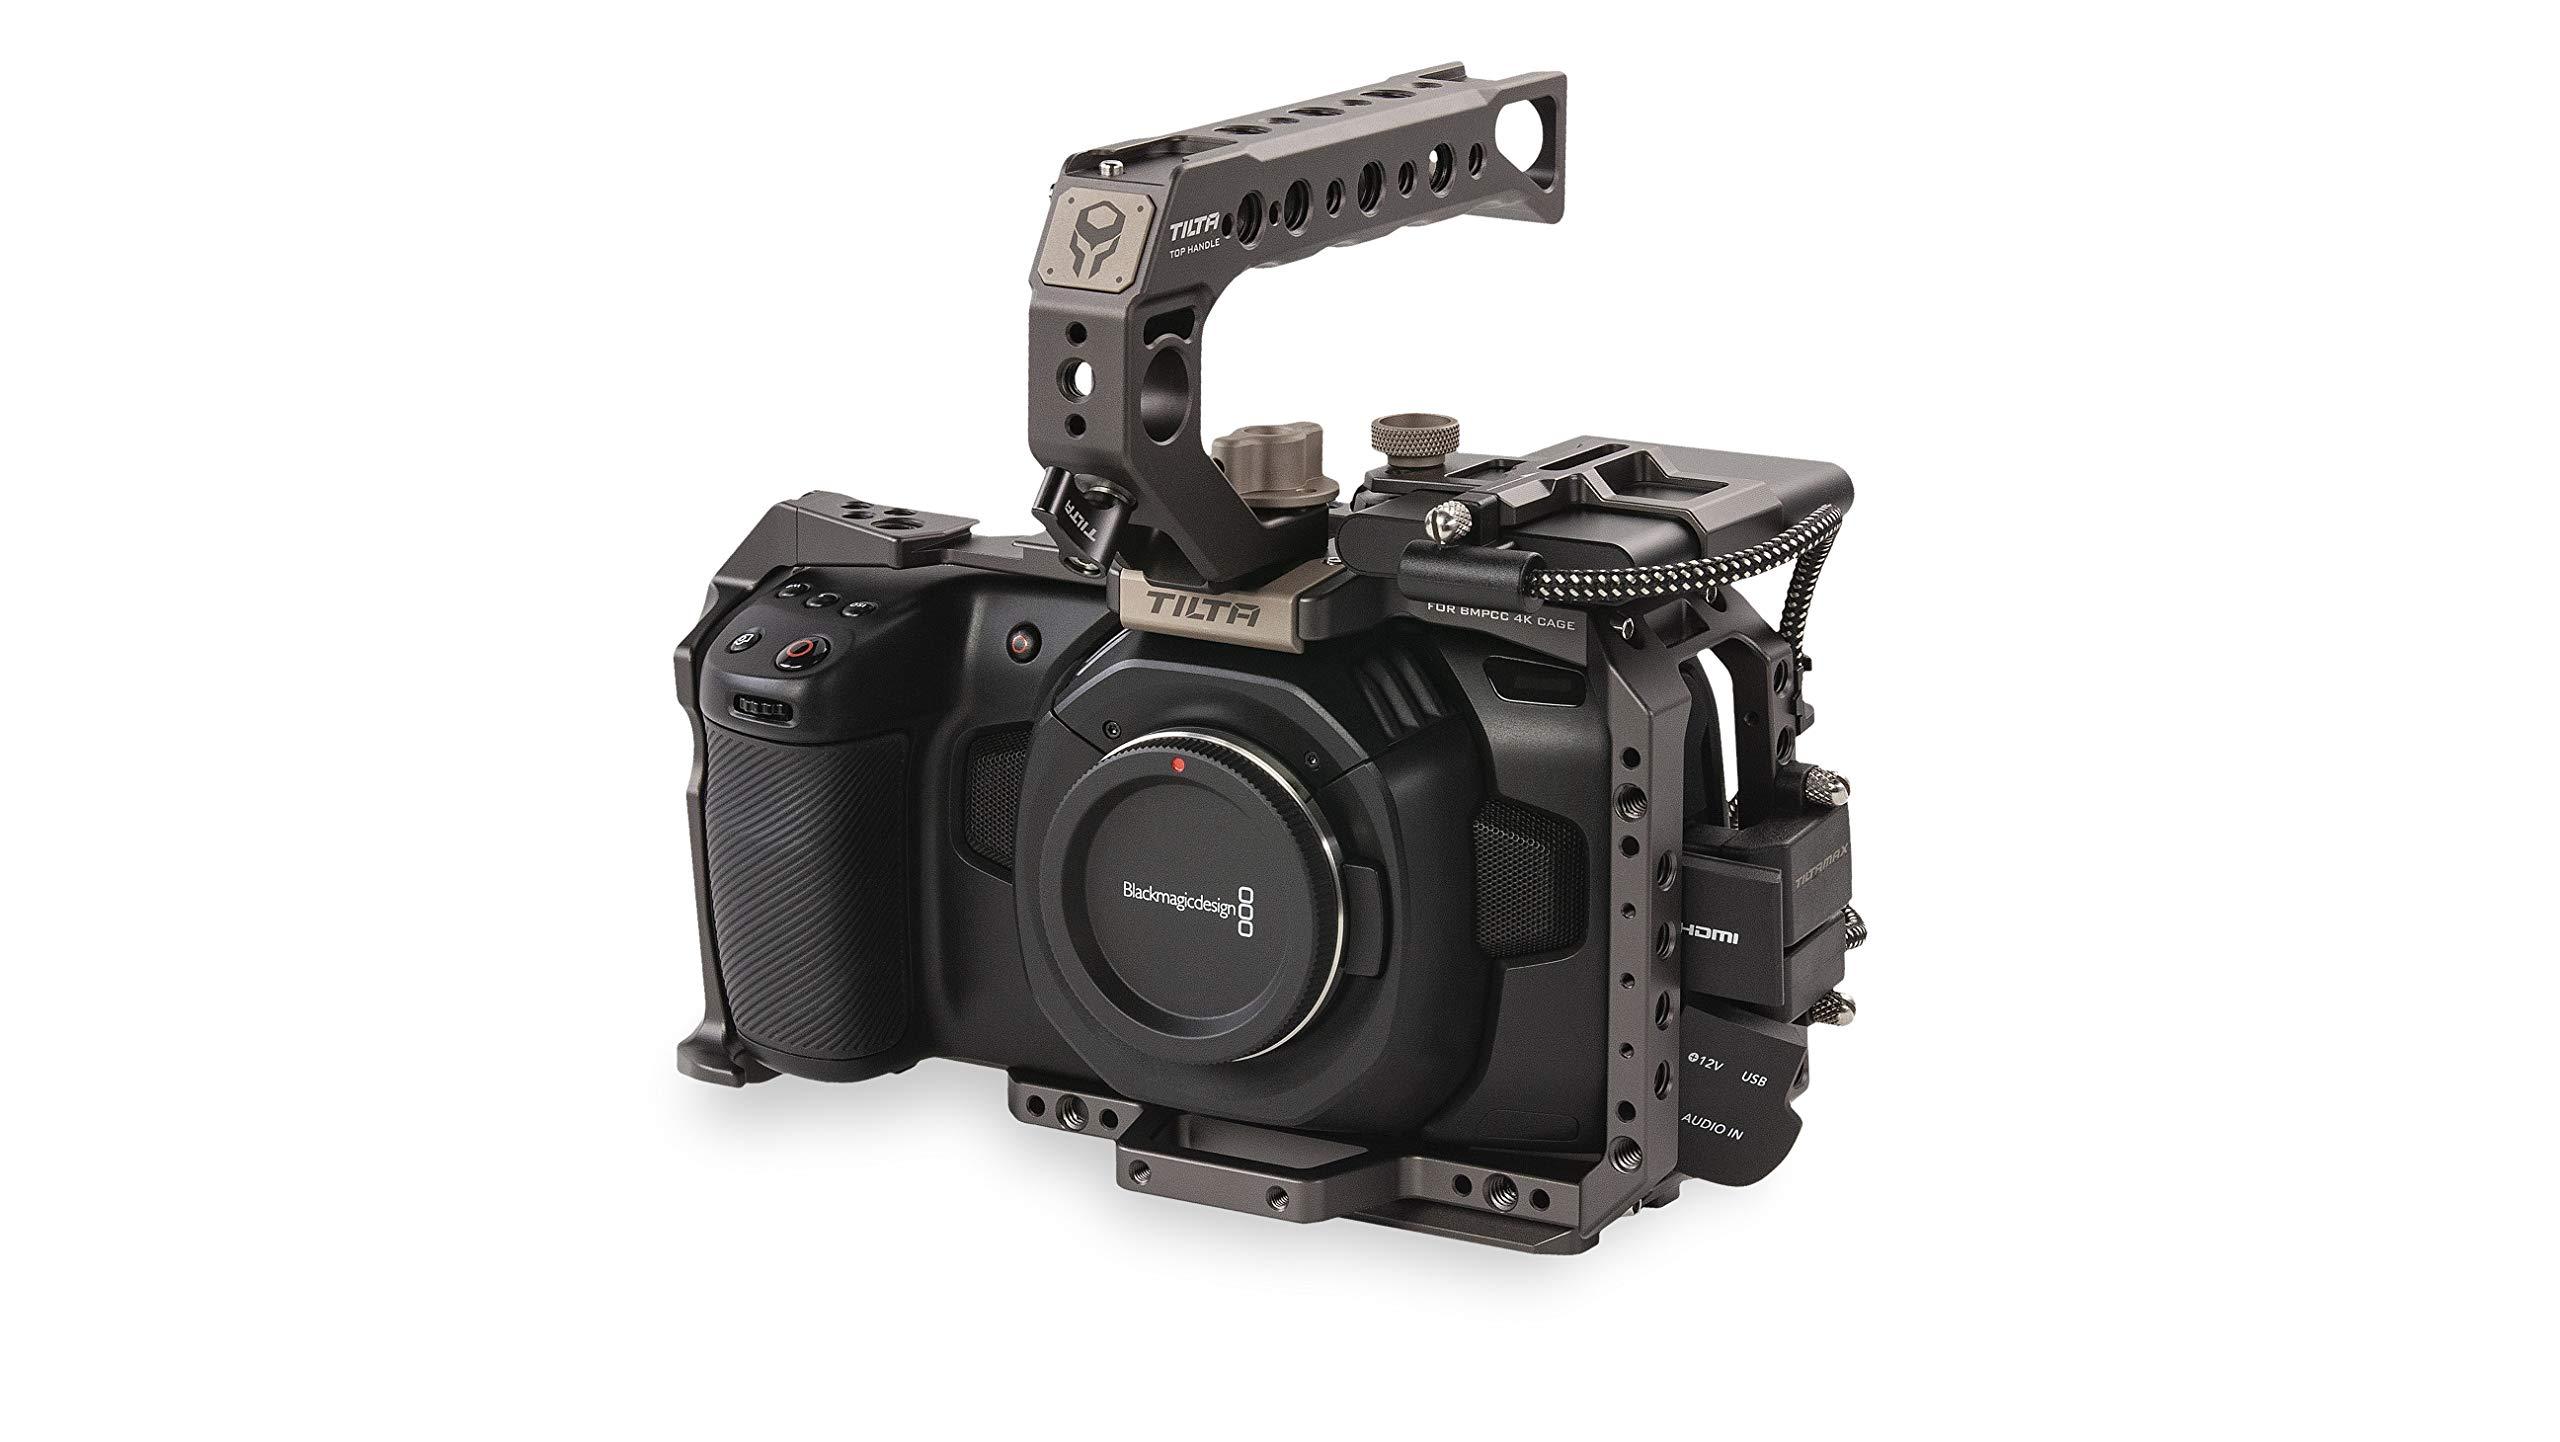 Tilta Camera Cage for BMPCC 4K - Basic Kit SSD Drive Holder Top Handle for BMPCC 4K Camera (Tilta Gray) by Tilta